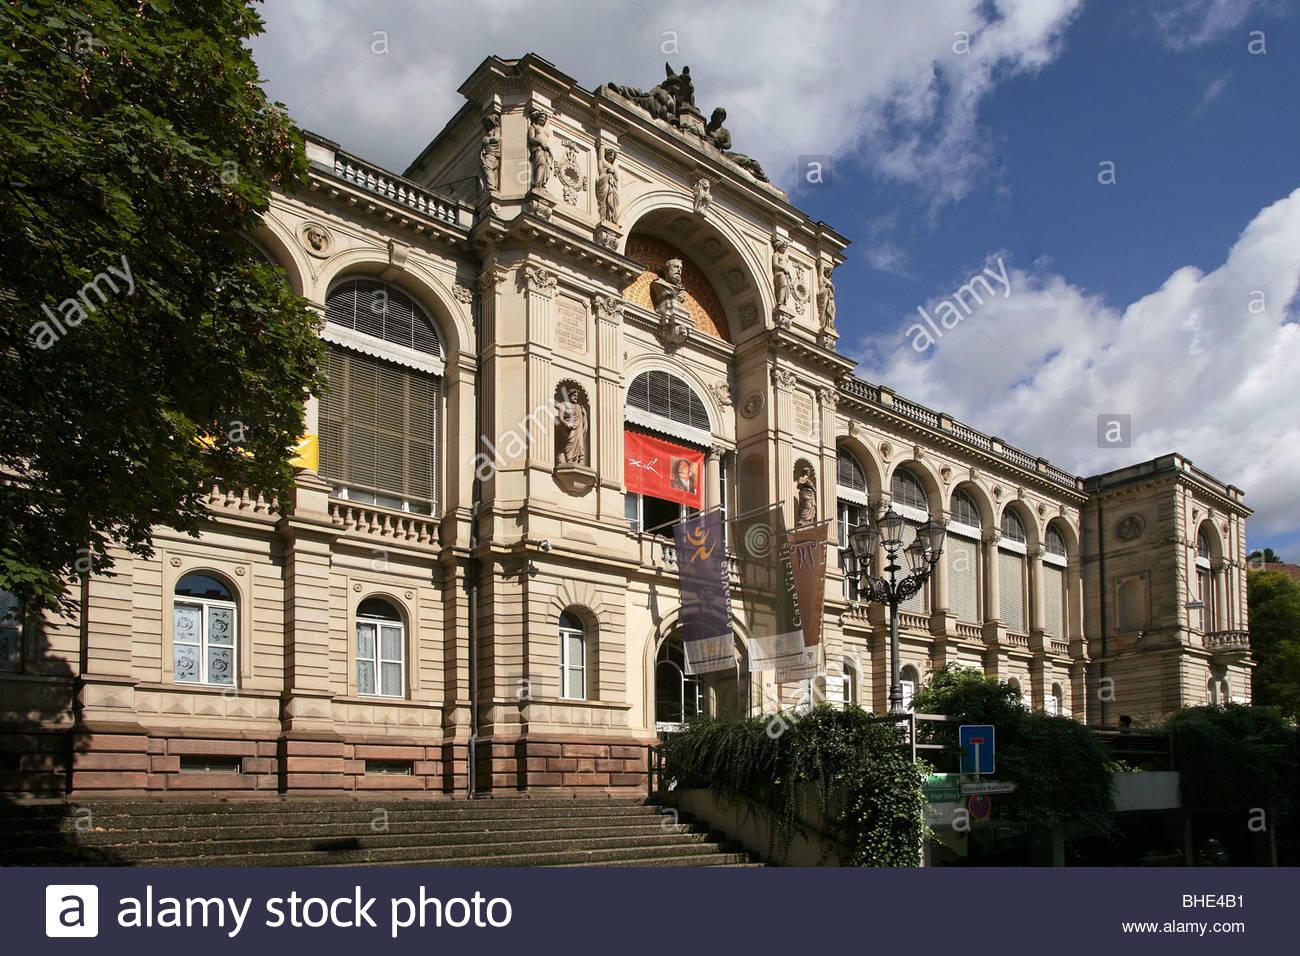 Spas friedrichbad, 1877, Baden-Baden, Baden-Württemberg, Germany, Europe - Stock Image